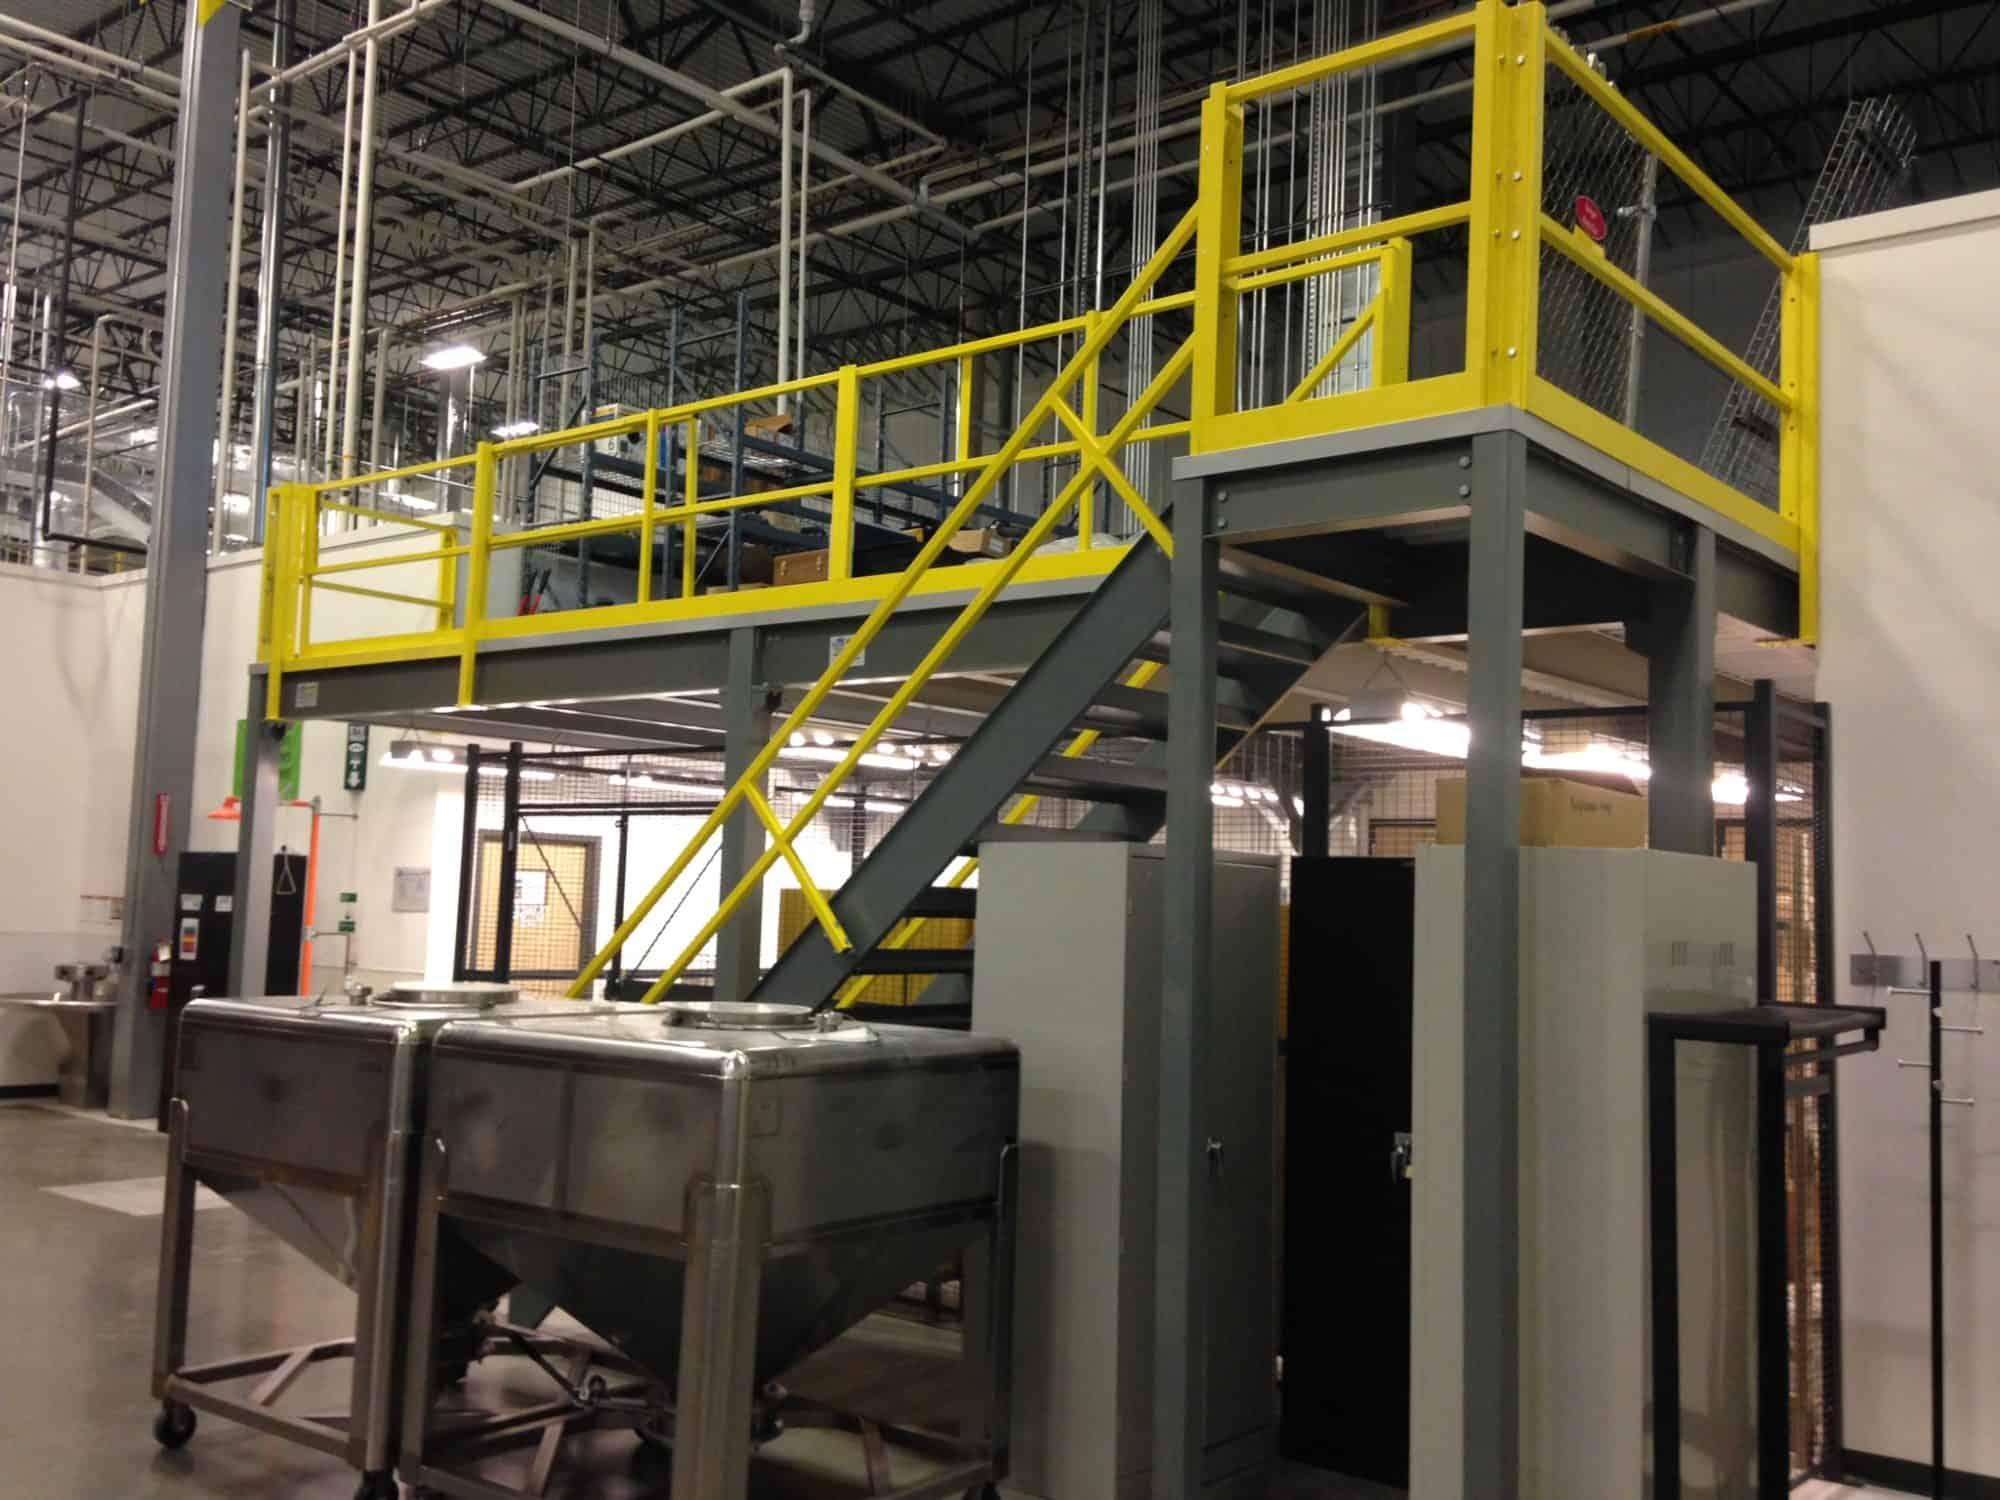 An industrial mezzanine work platform built by Porta-King